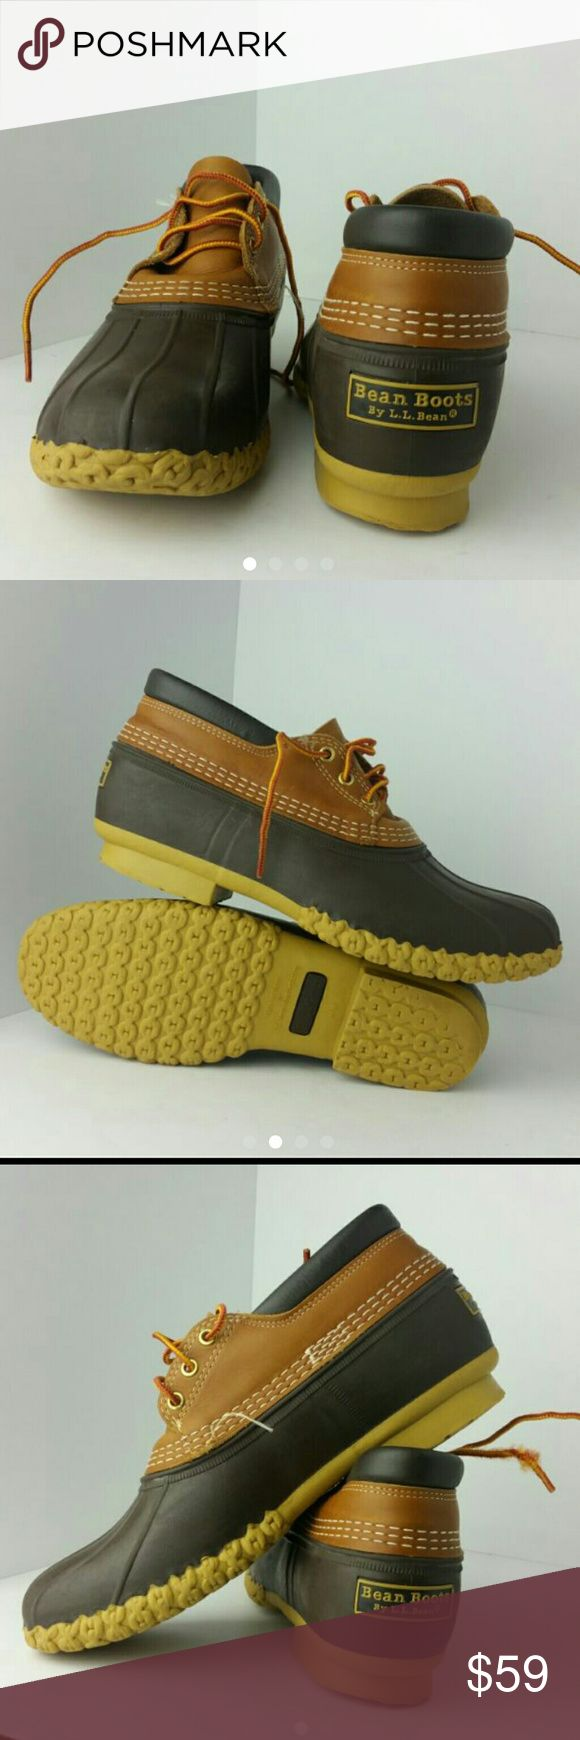 LL BEAN MEN'S DUCK BOOT VERY CLEAN INSIDE-OUT   SKE # BV L.L. Bean Shoes Boots